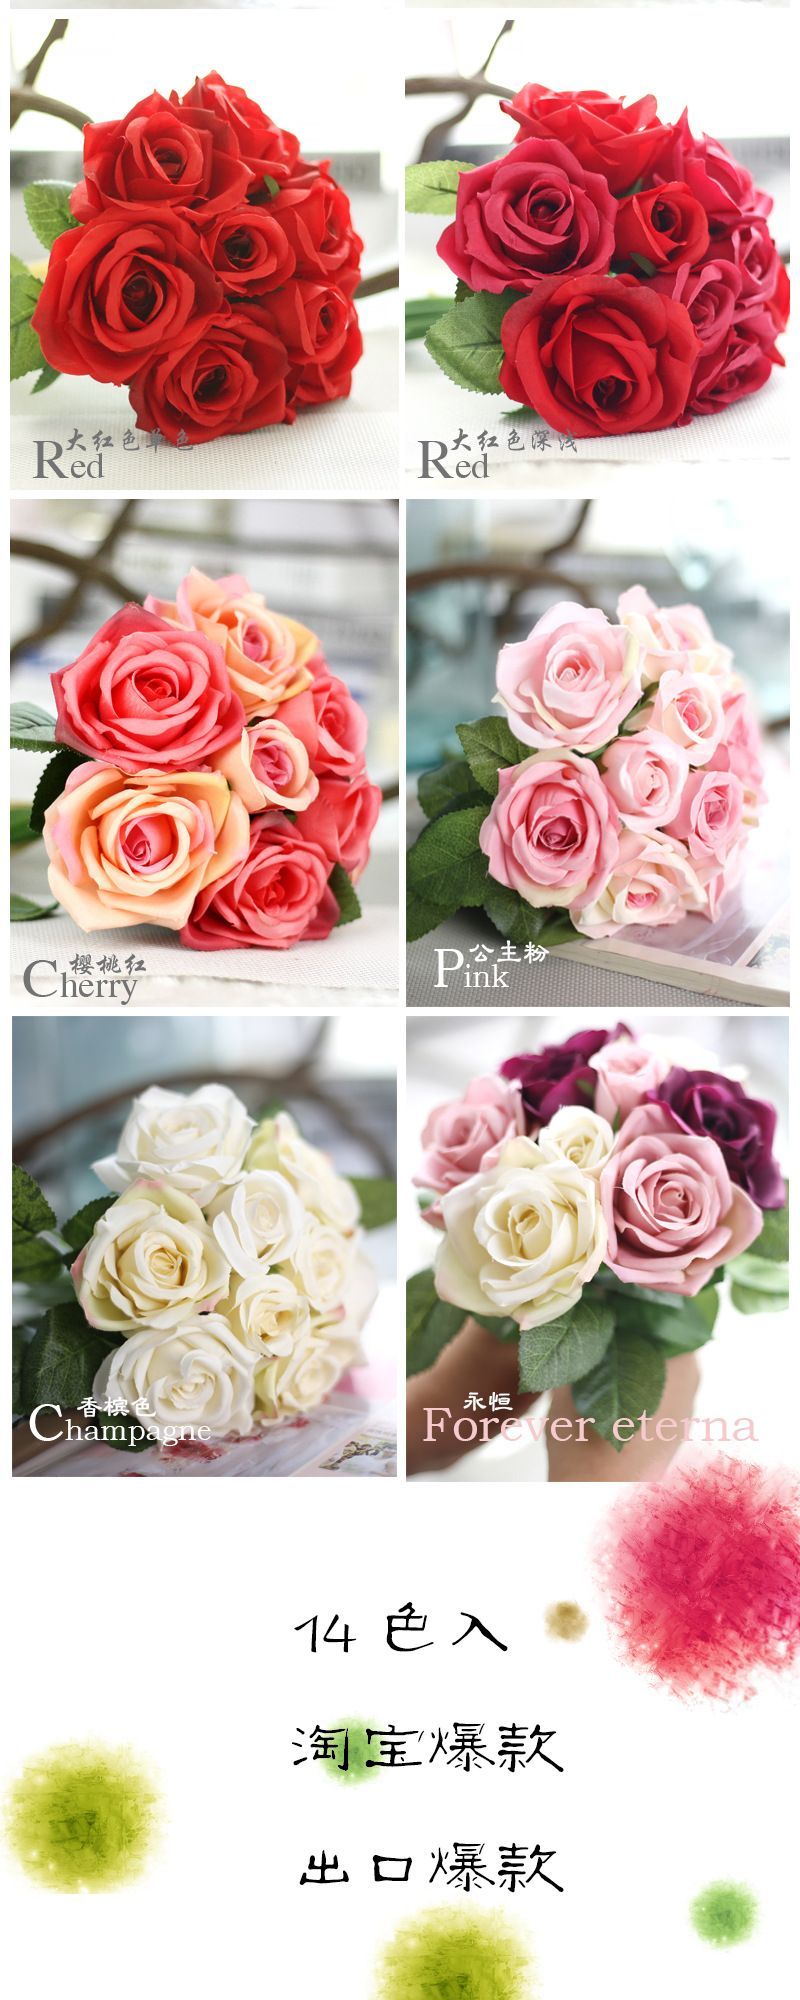 Artificial Flowerartificial Flowers For Decoration Artificial